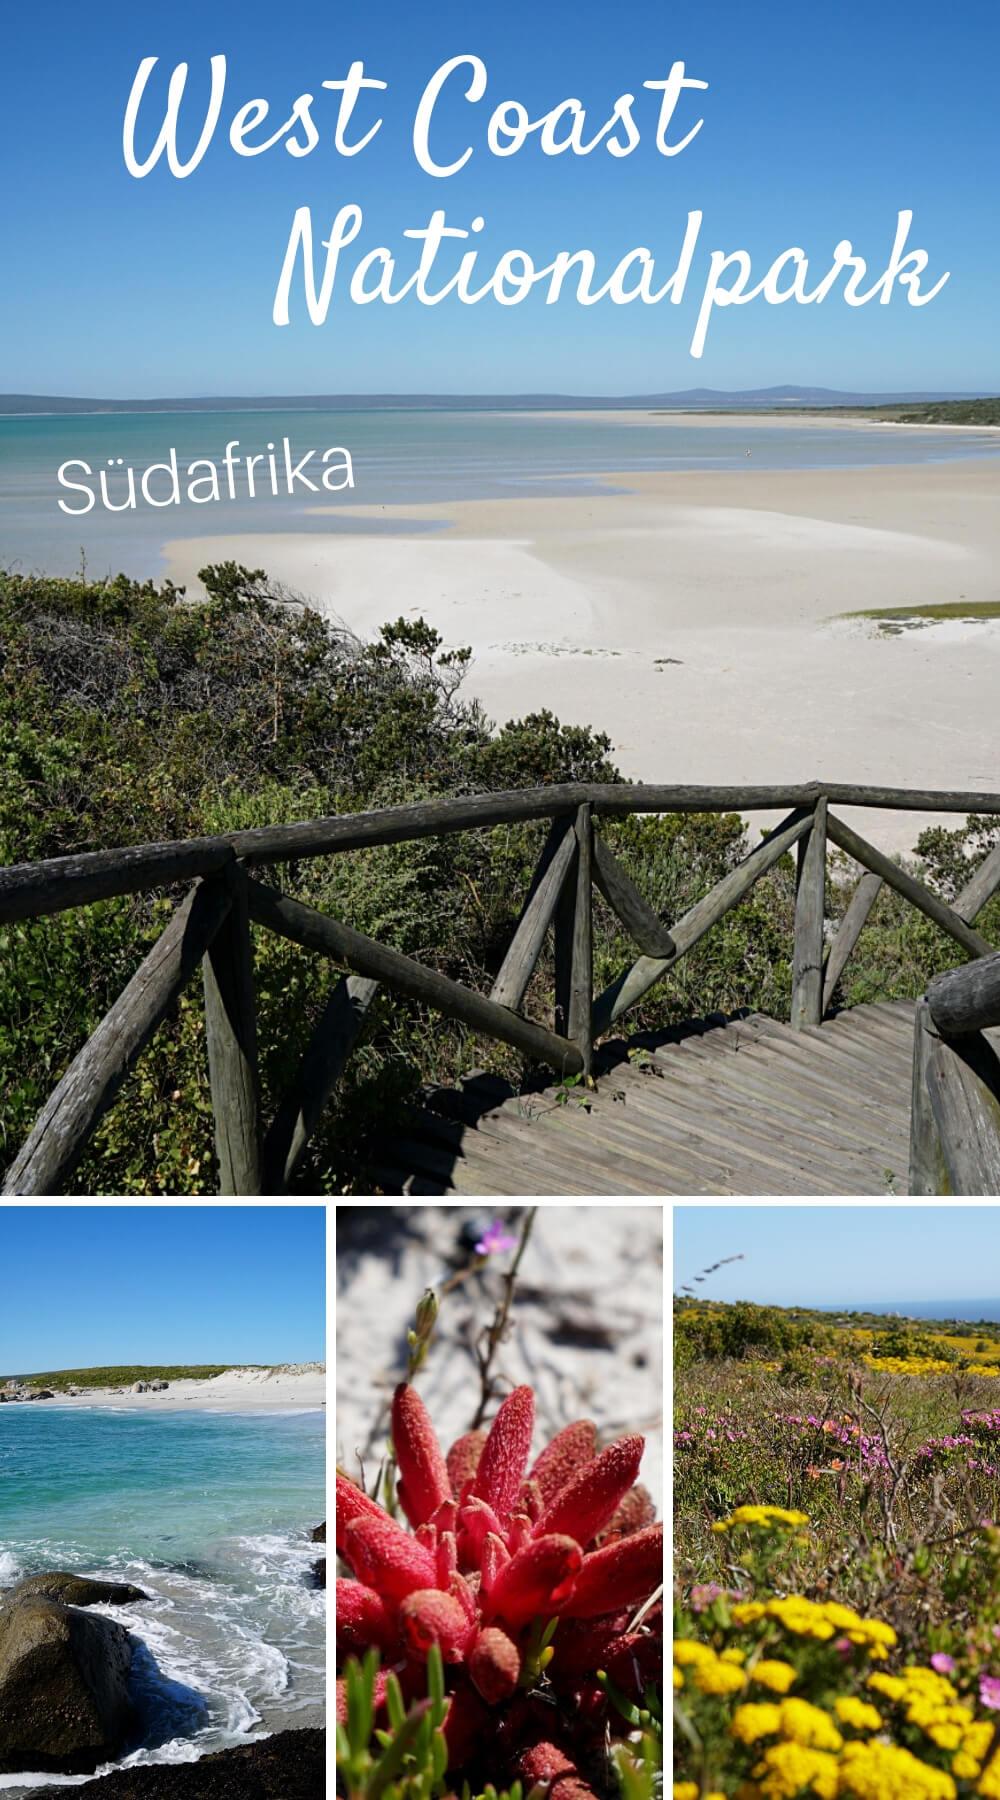 Ein traumhafter Tag im West Coast Nationalpark an Südafrikas Westküste